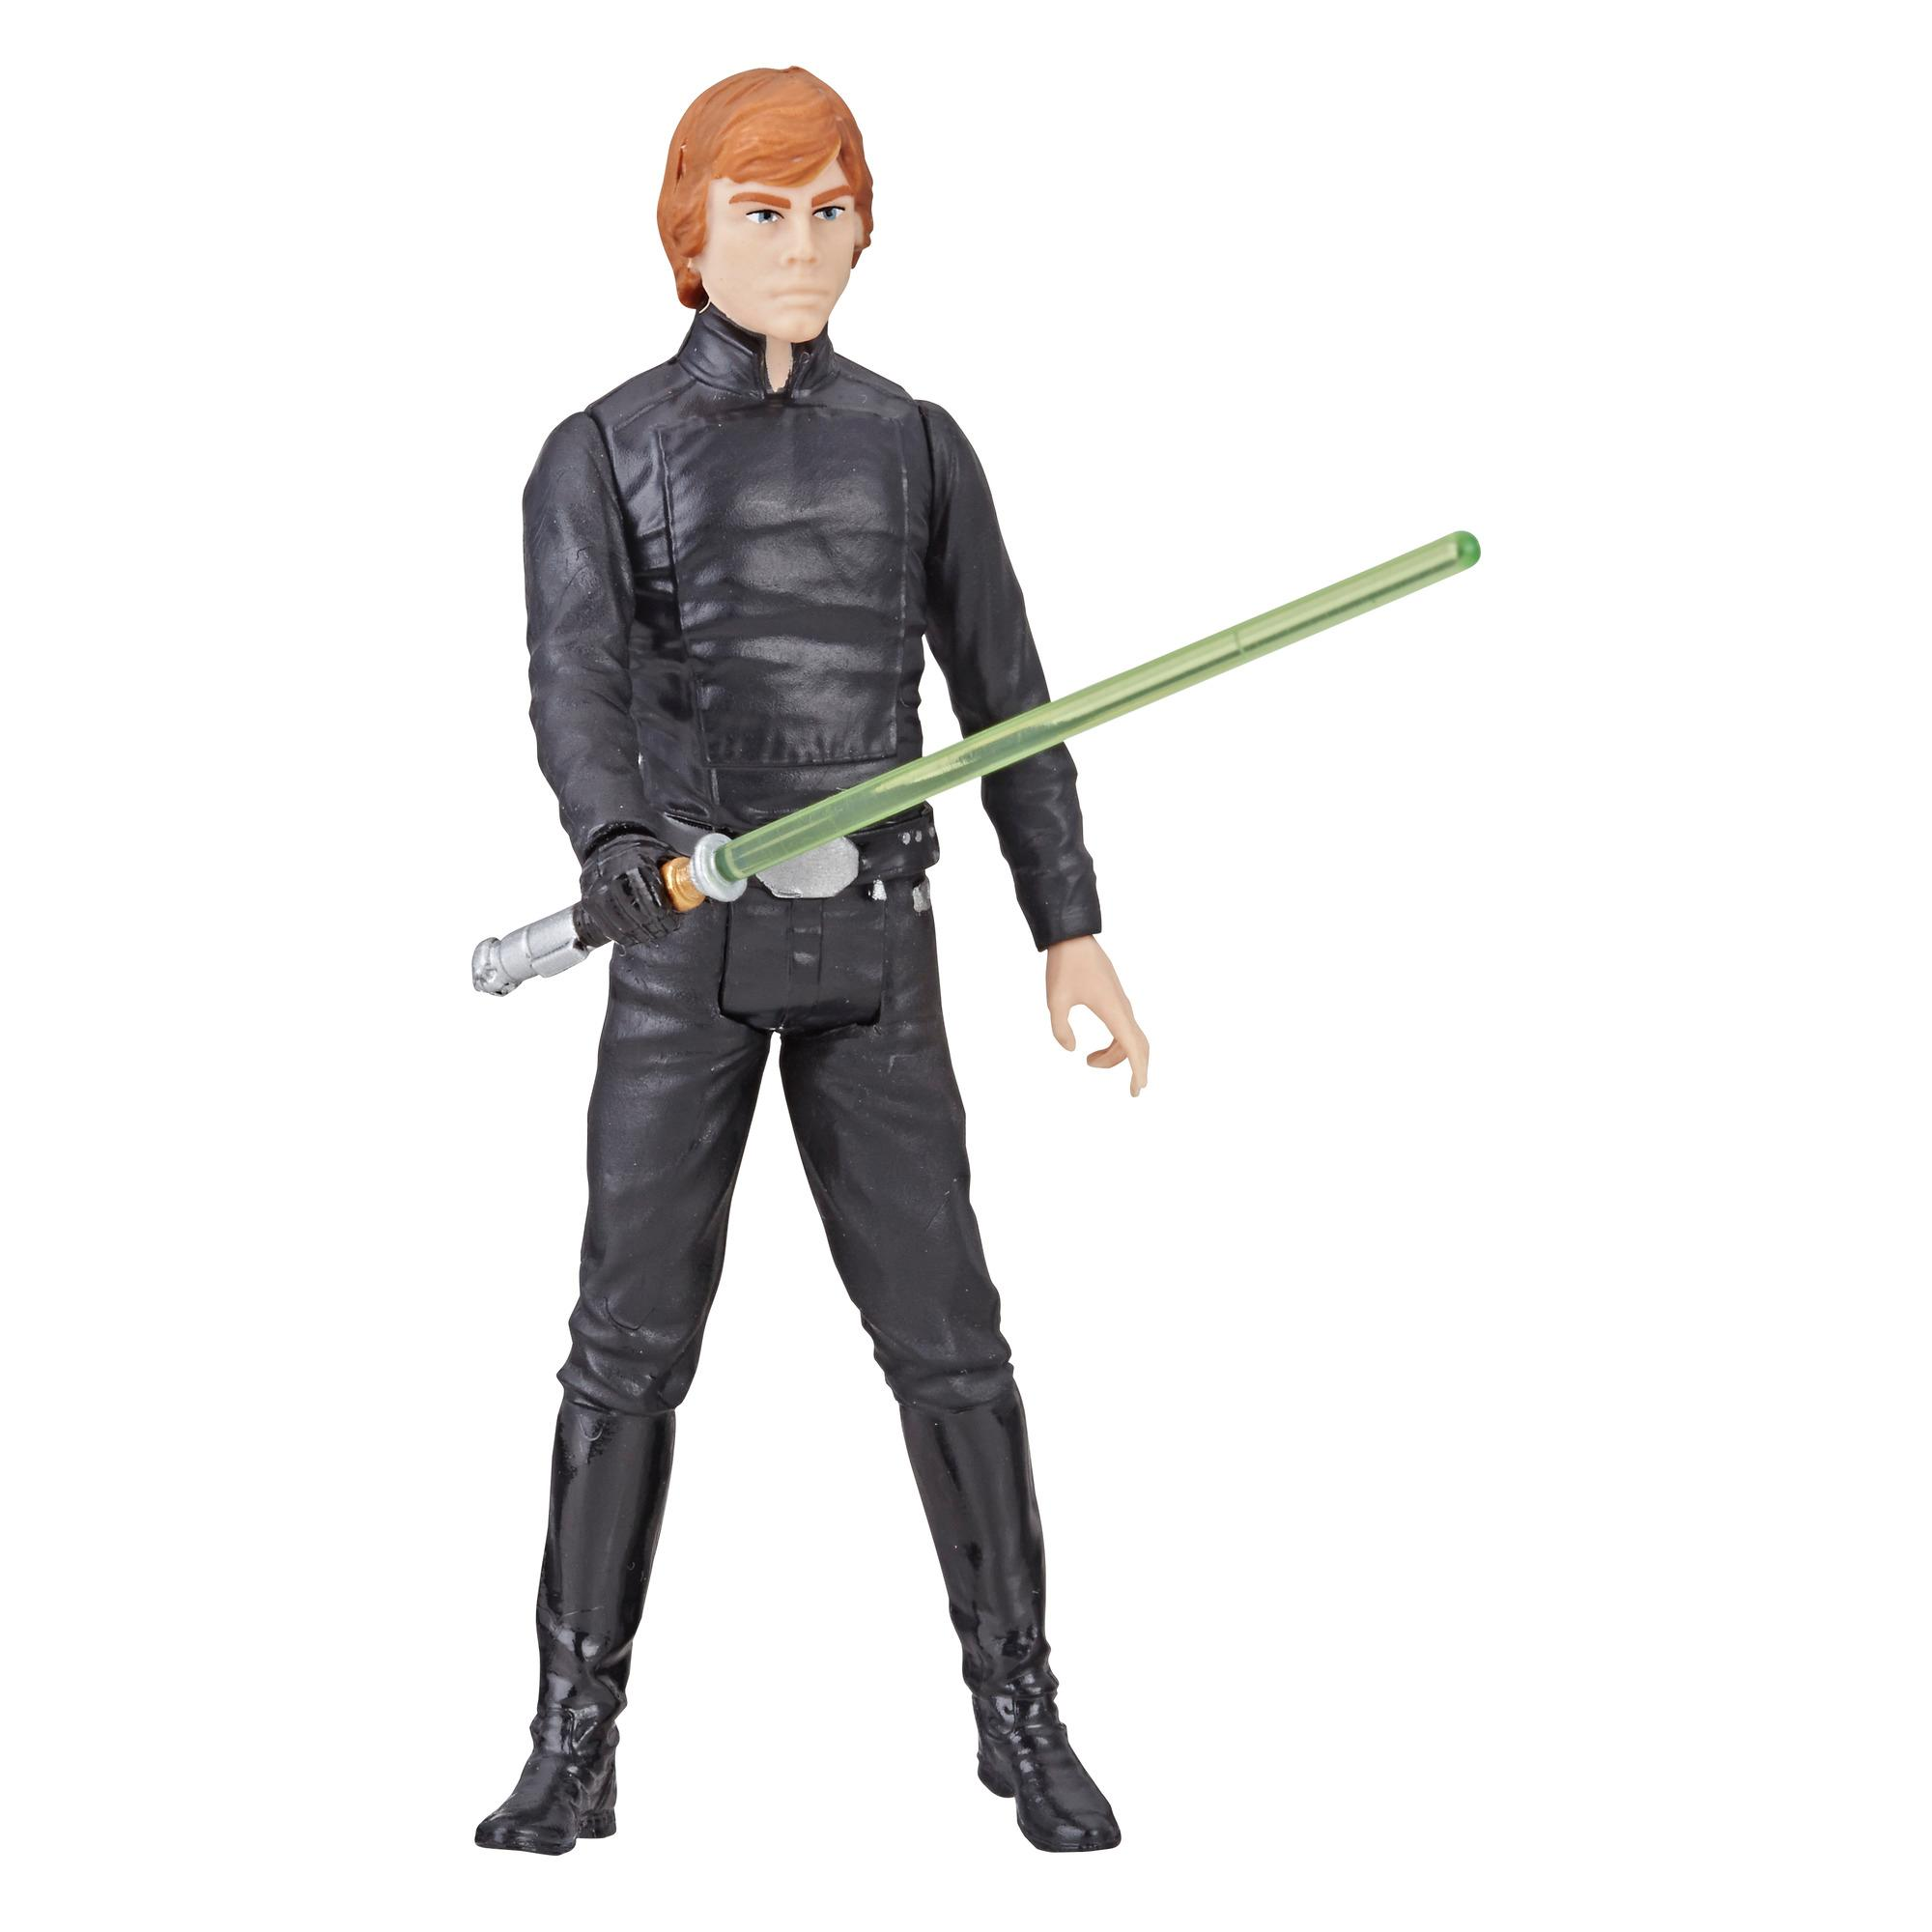 Star Wars Galaxy of Adventures Luke Skywalker Figure and Mini Comic